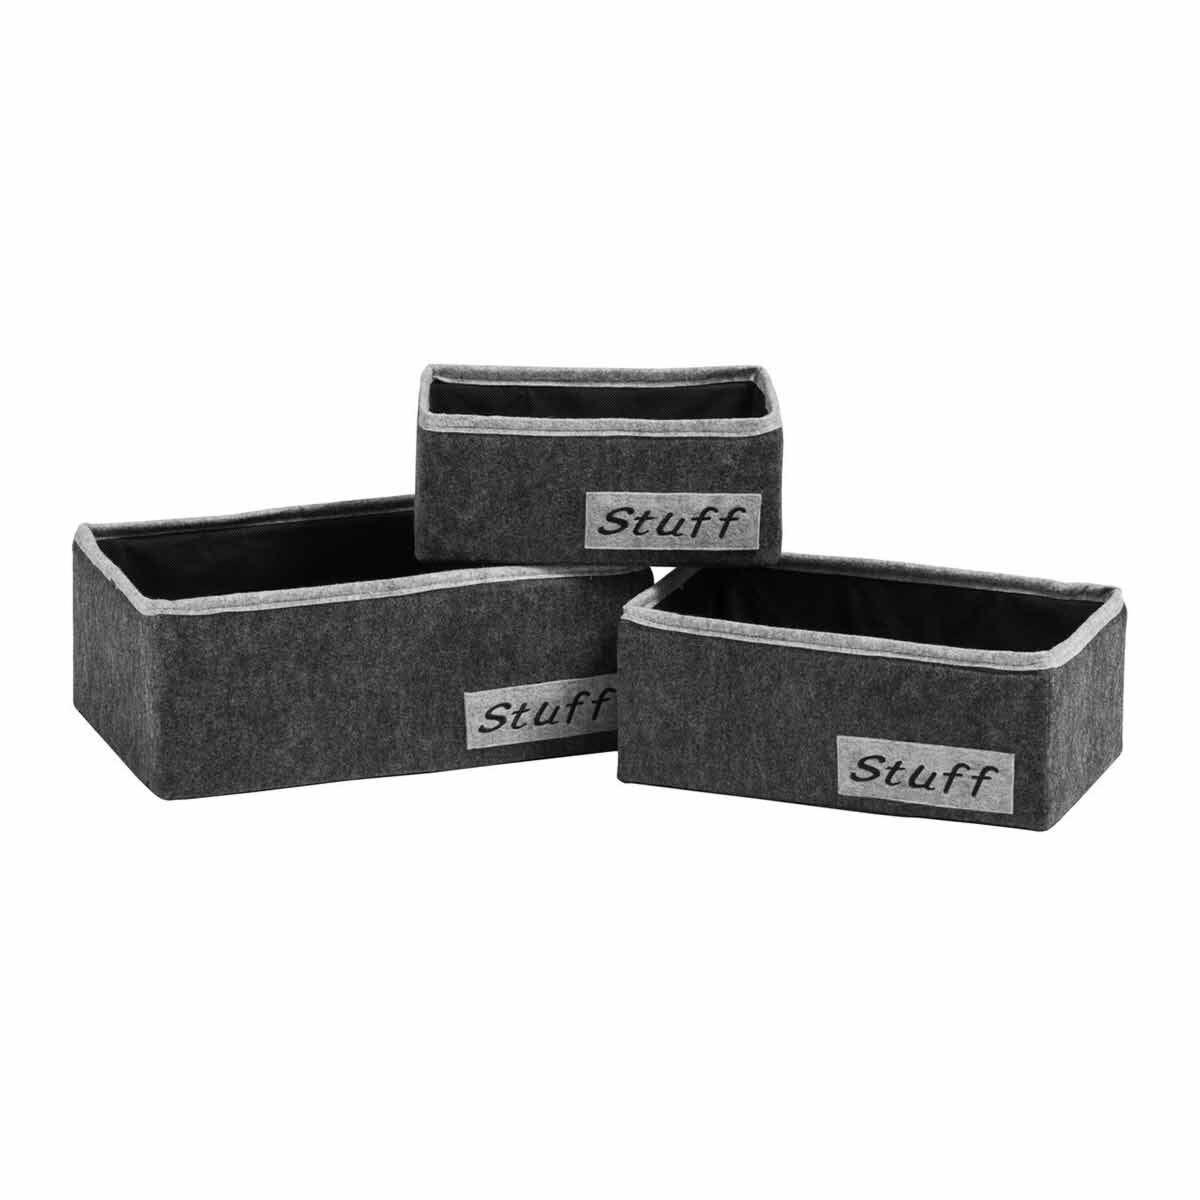 Premier Housewares Stuff Storage Boxes Dark Grey and Light Grey Set of 3